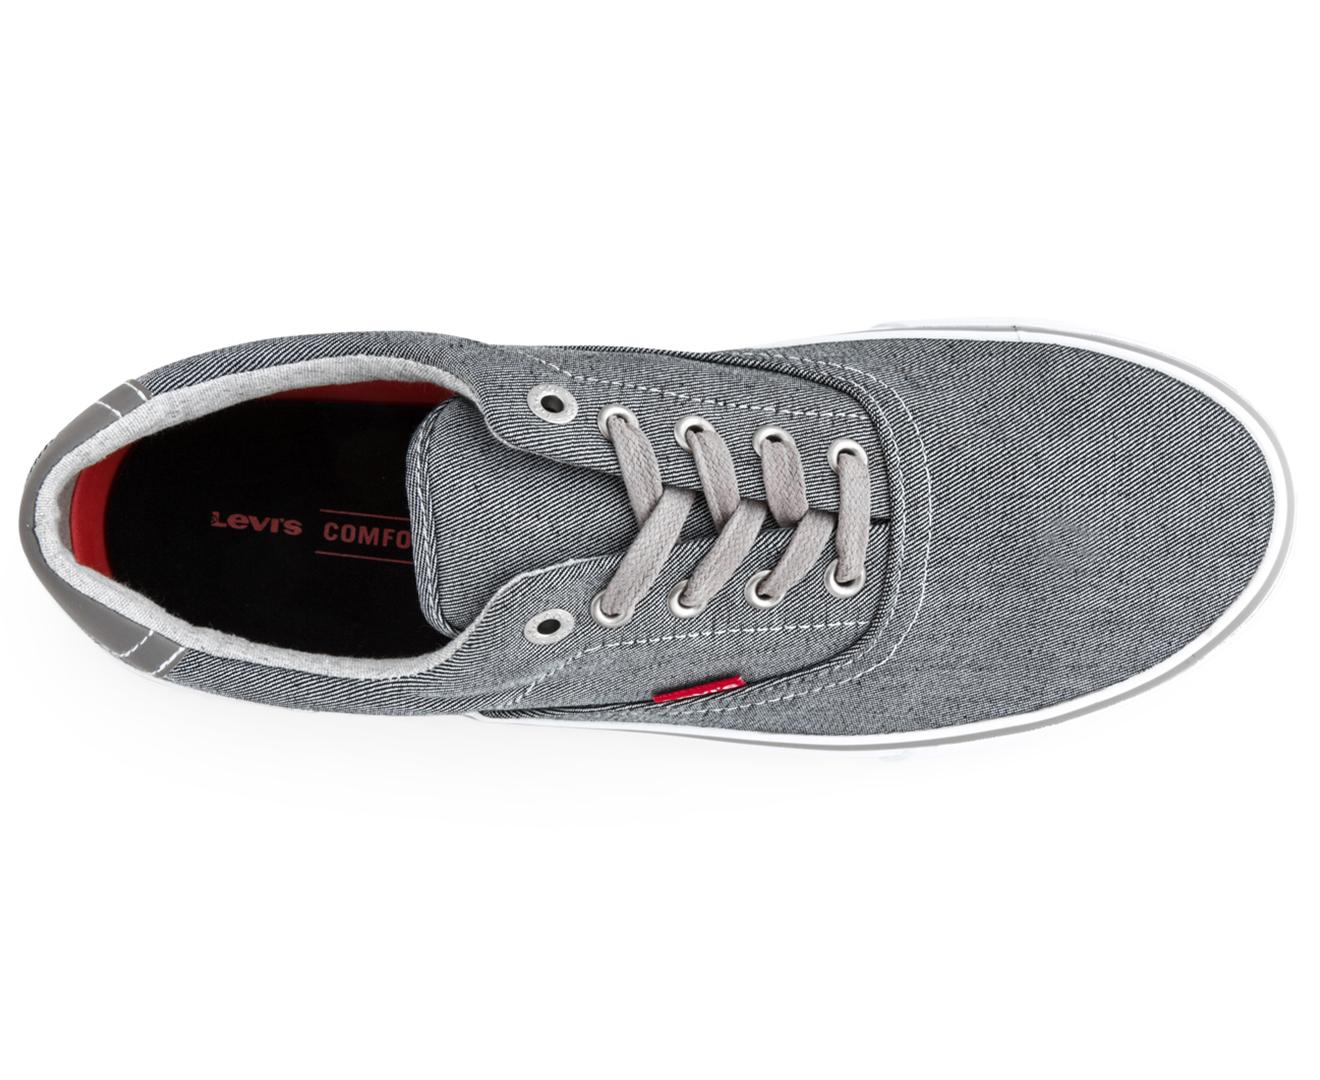 Levi S Comfort Textile Upper Shoes